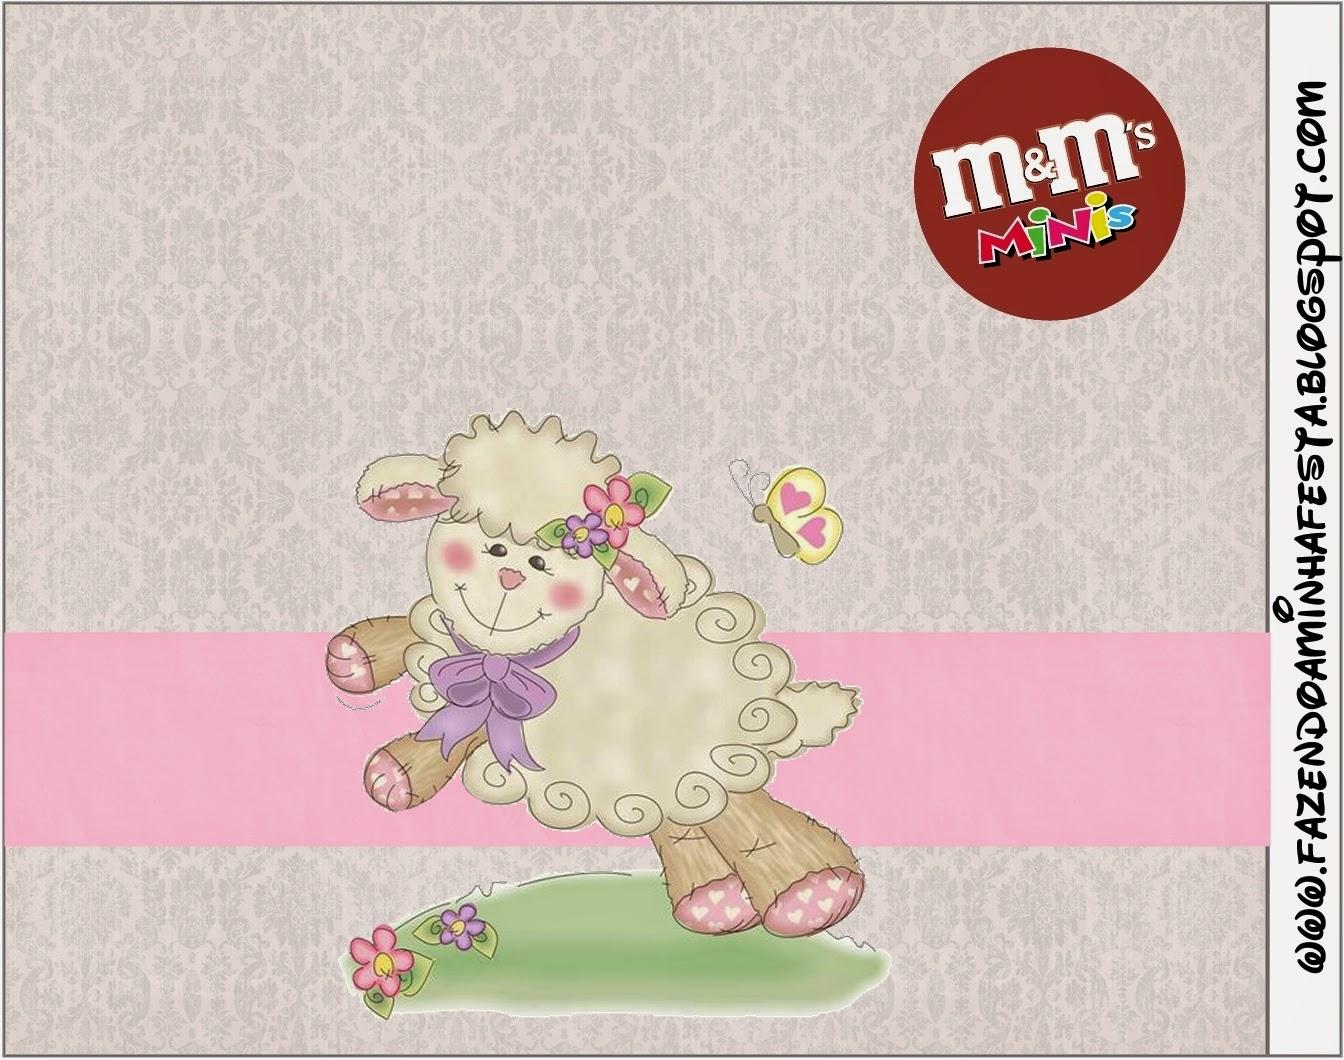 Etiqueta M&;M de Ovejita en Fondo Rosa para imprimir gratis.